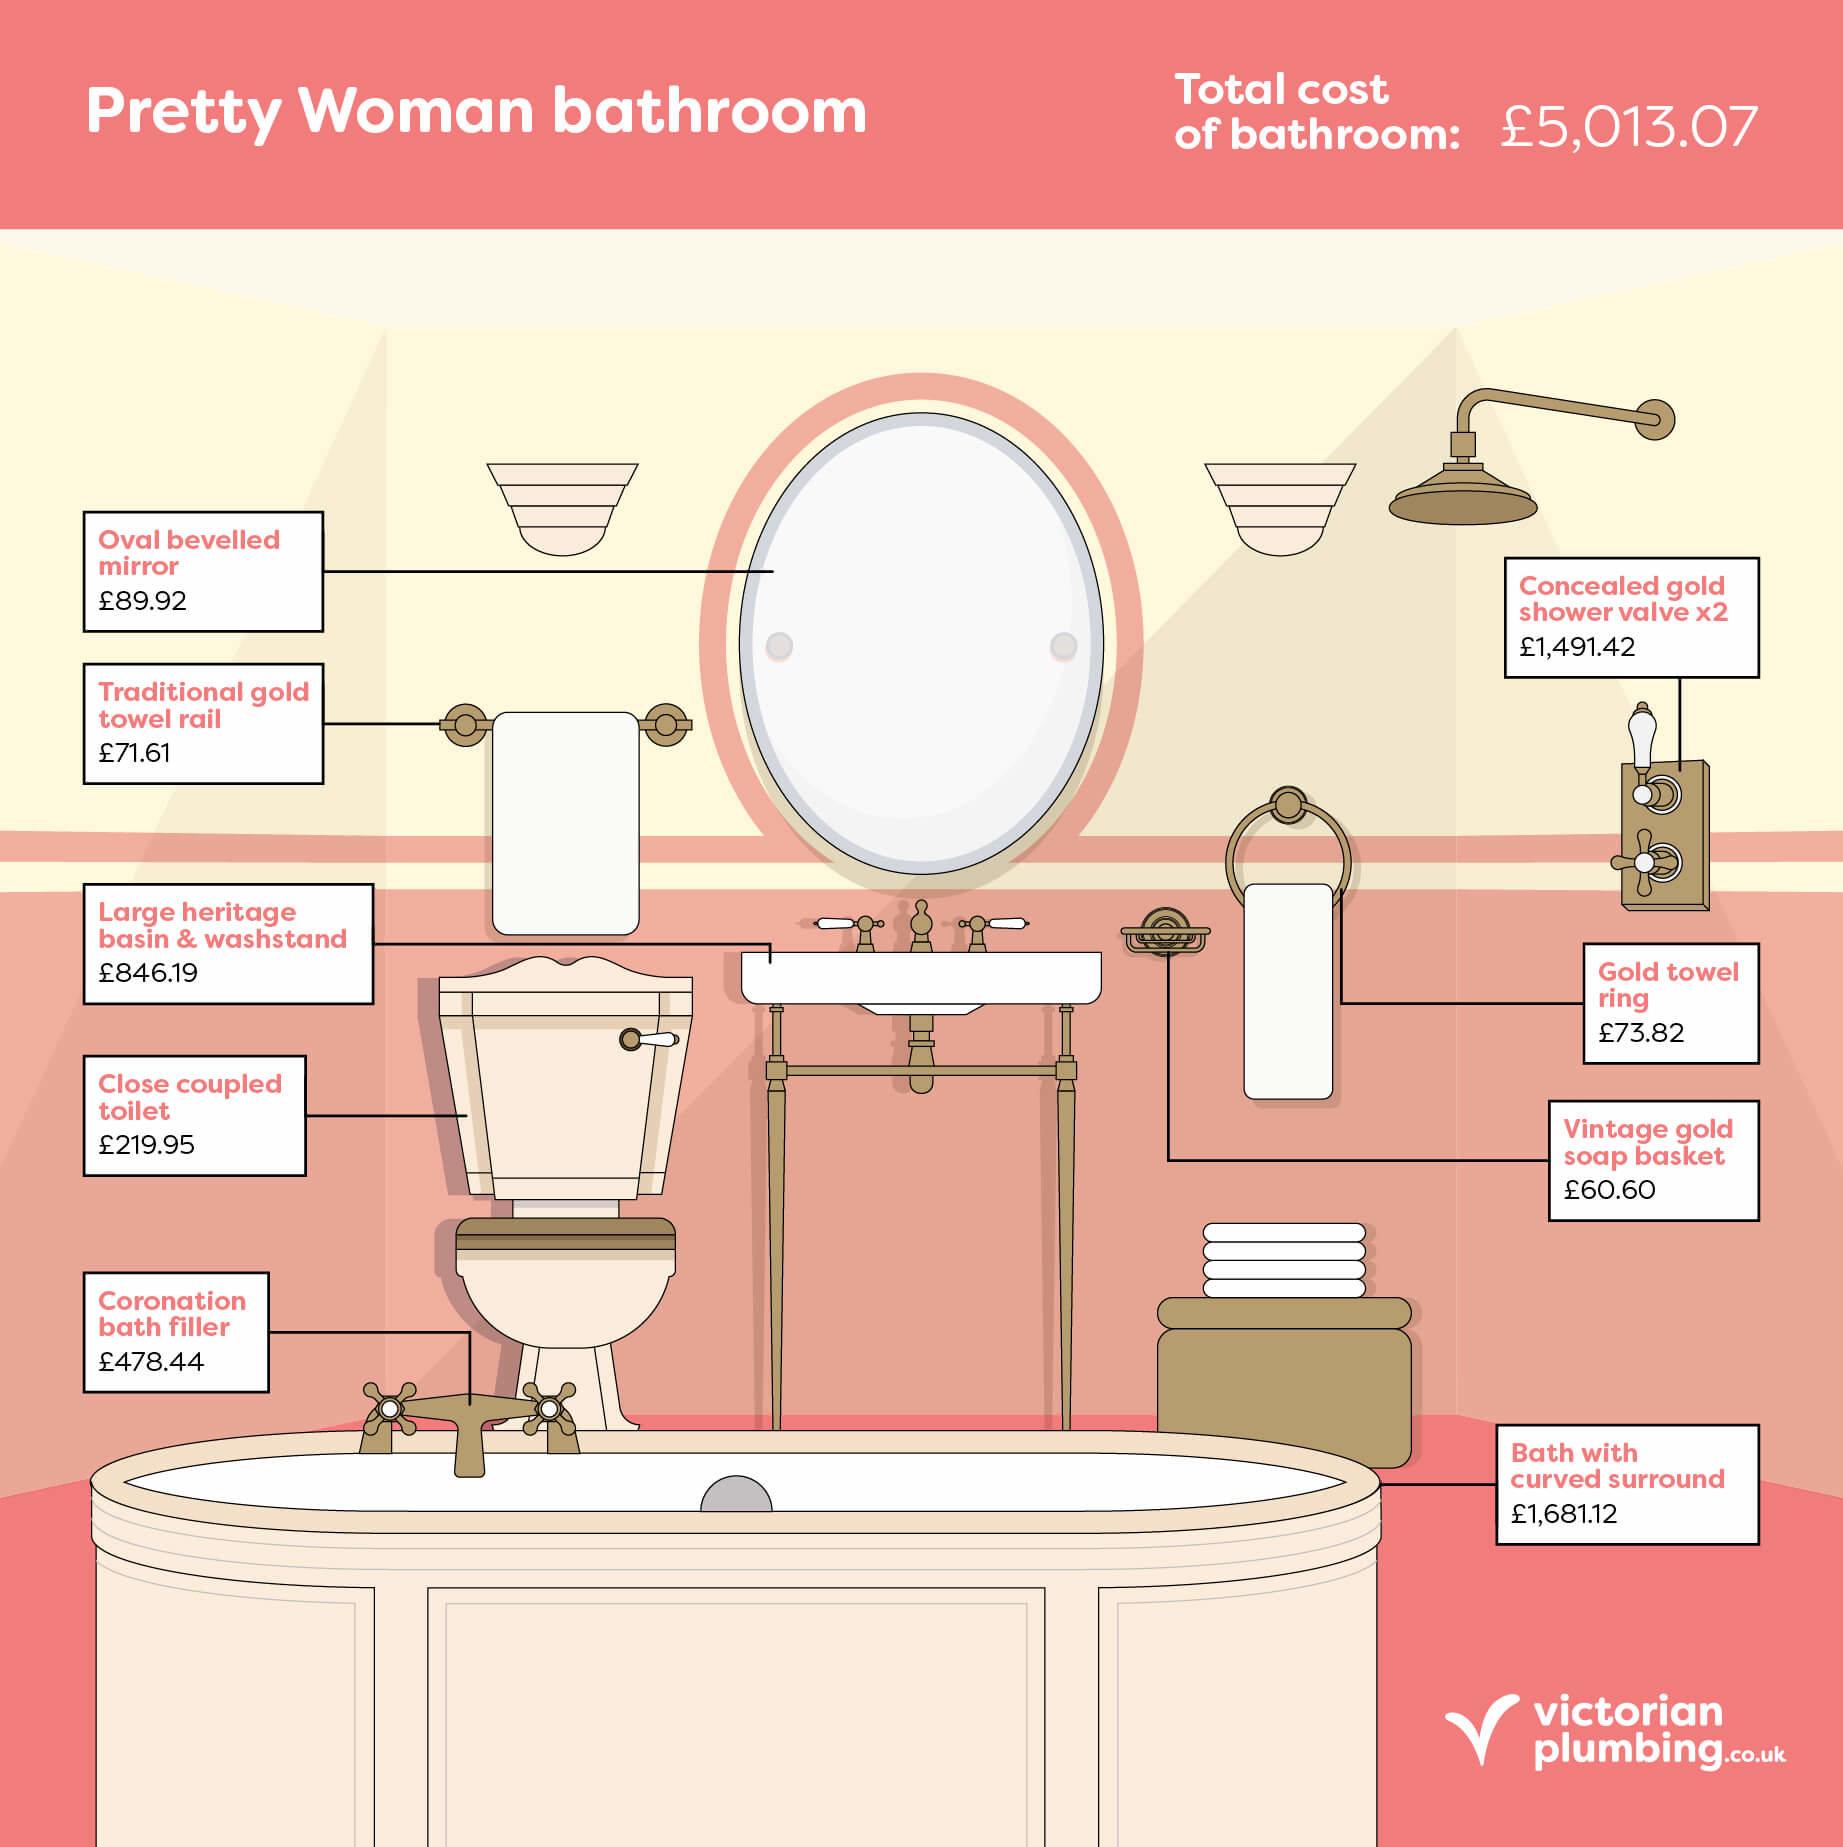 Fictional Bathrooms: Pretty Woman